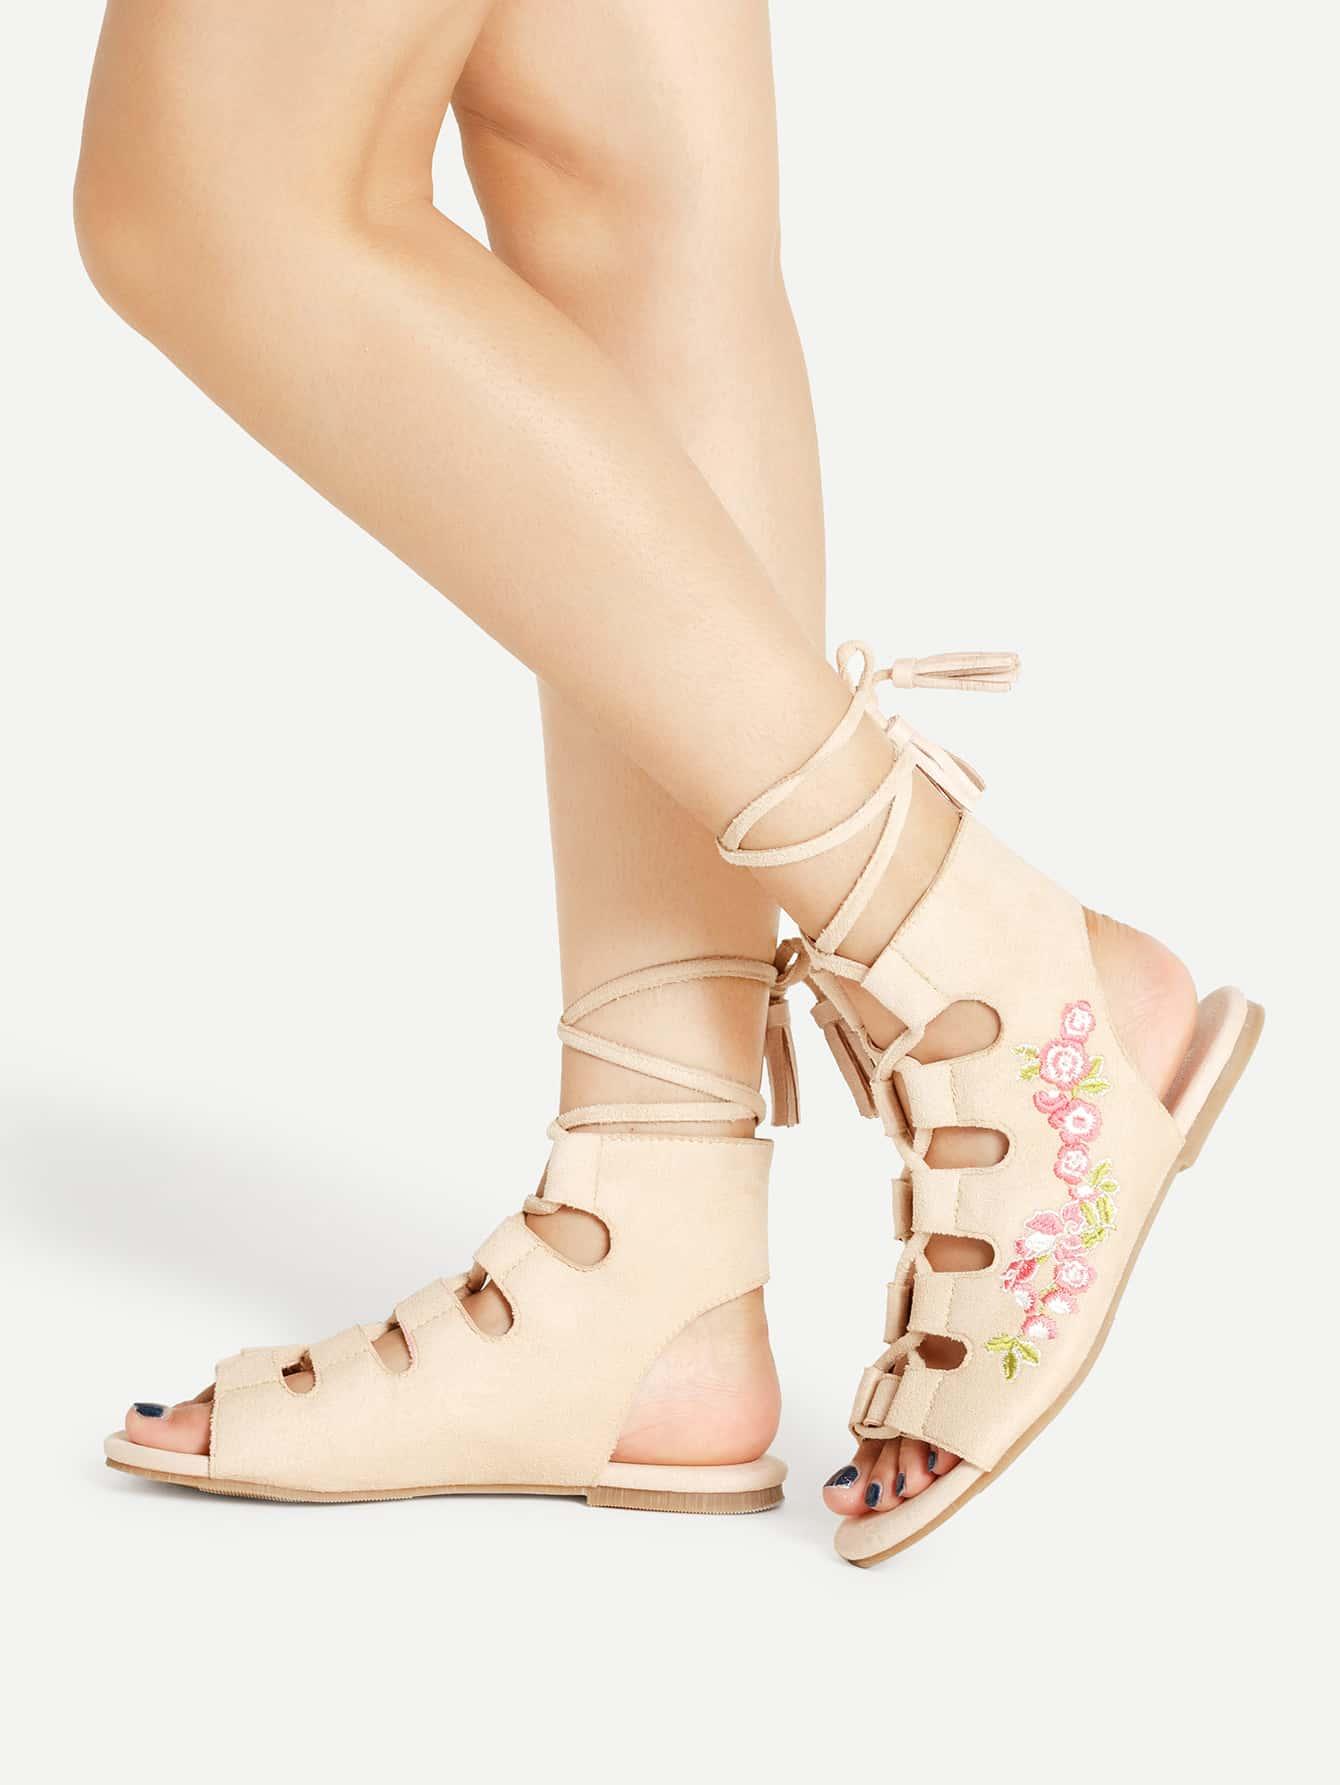 Фото Calico Embroidery Lace Up Flat Sandals With Tassel. Купить с доставкой